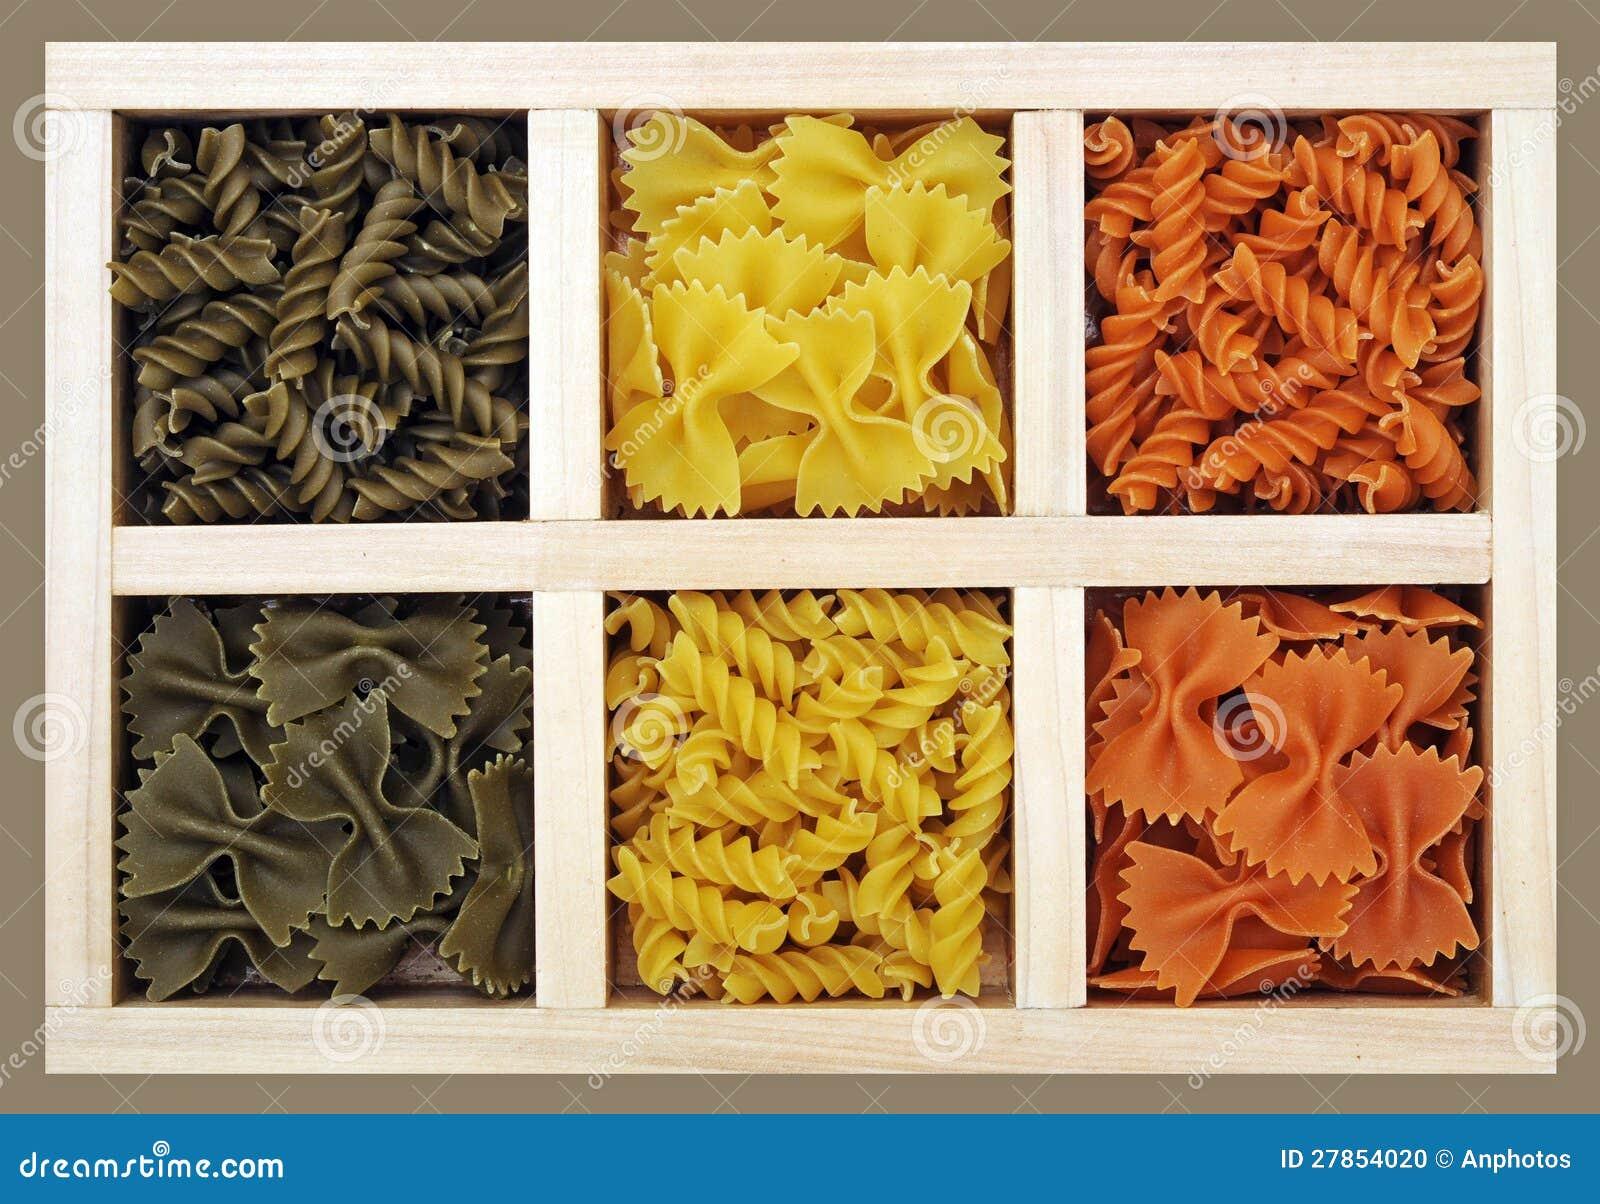 Farfalle i ślimakowaty makaron